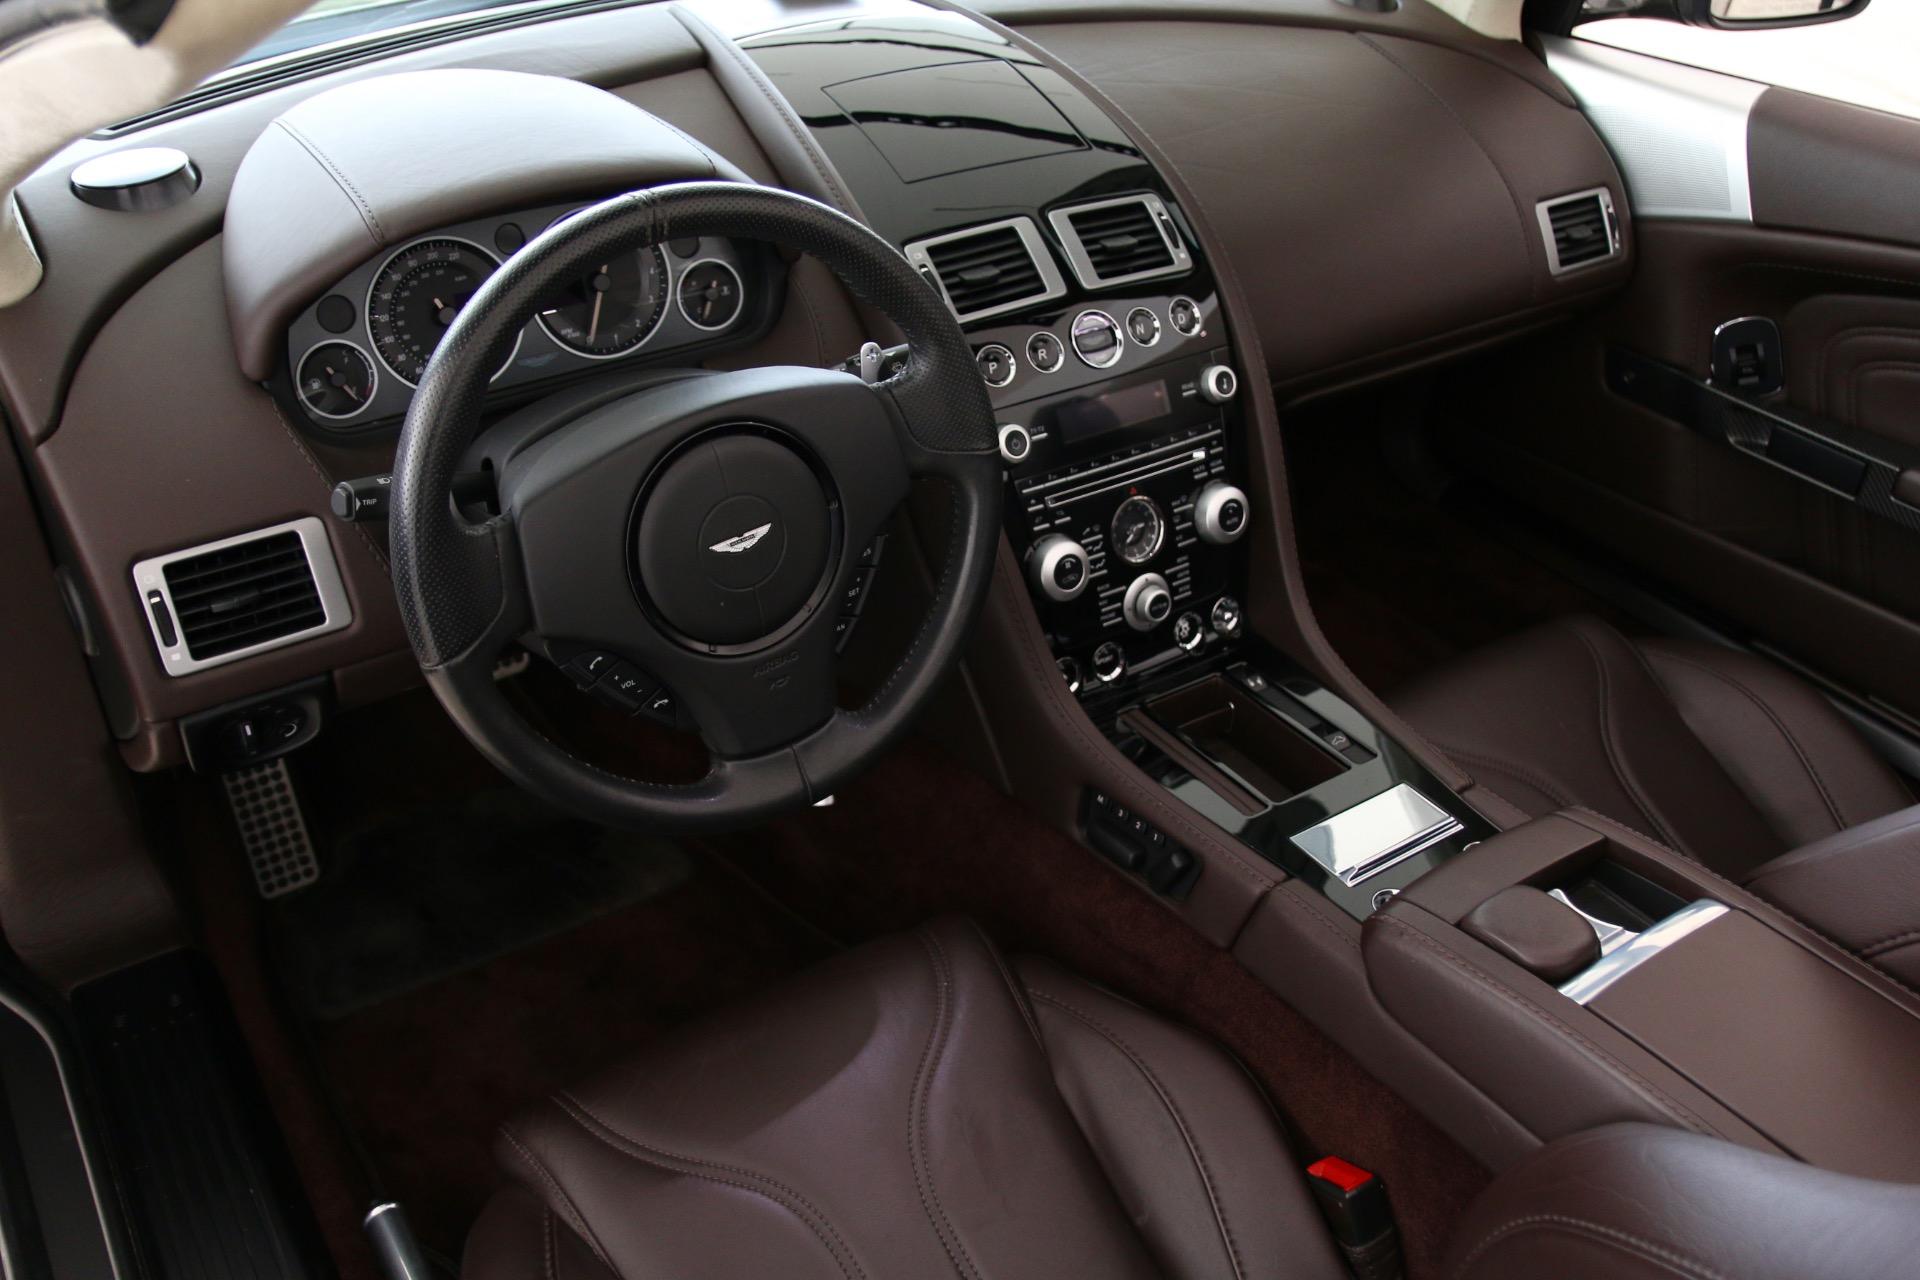 2011 Aston Martin Dbs Volante Stock 7nl02763a For Sale Near Vienna Va Va Aston Martin Dealer